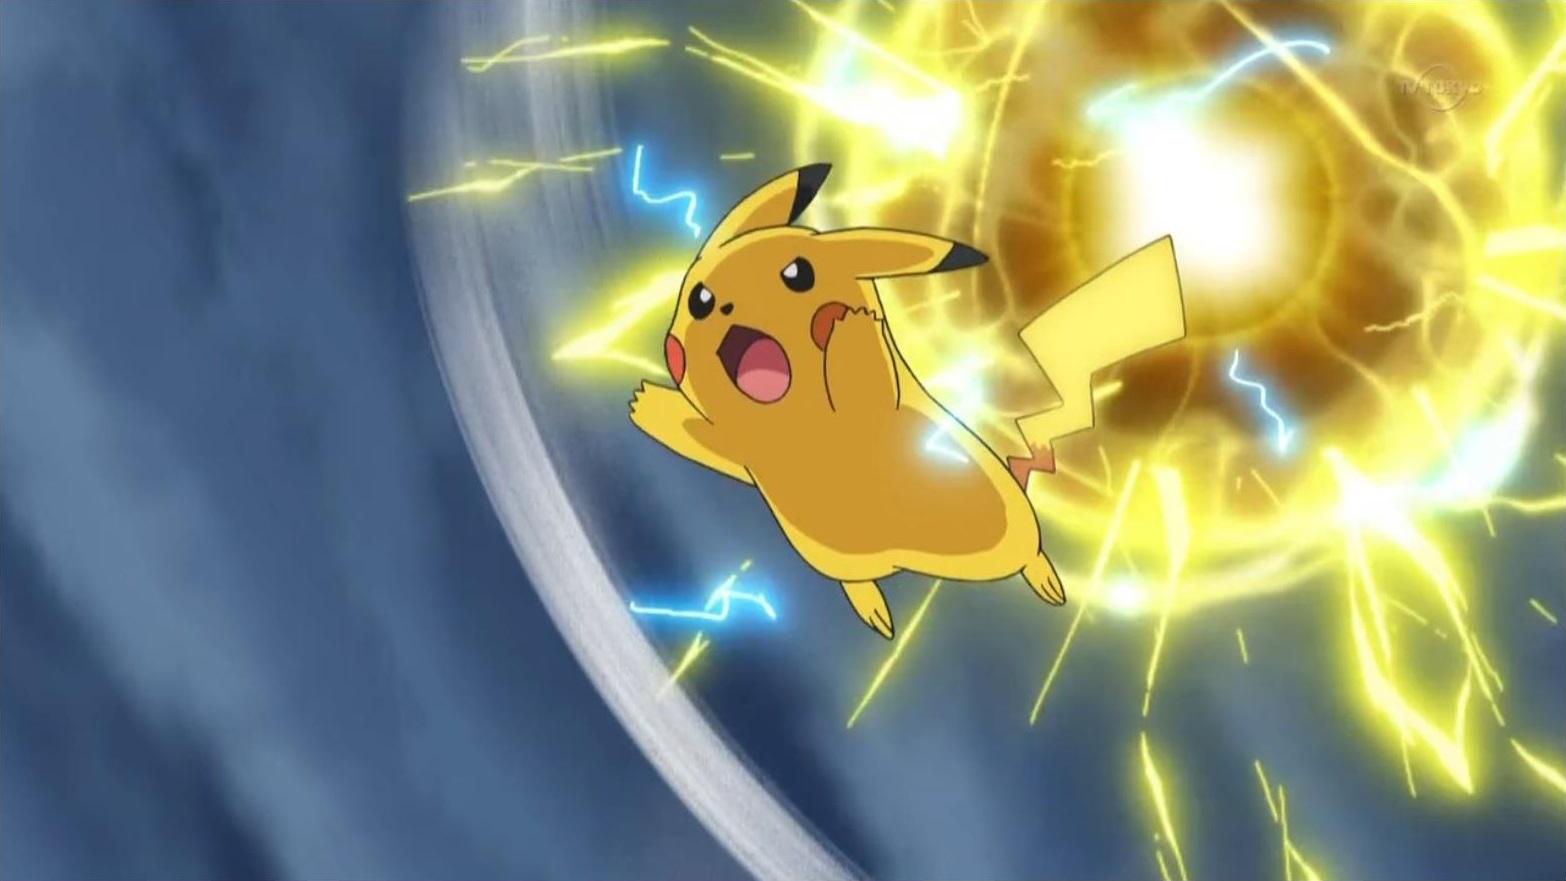 Pikachu electro ball